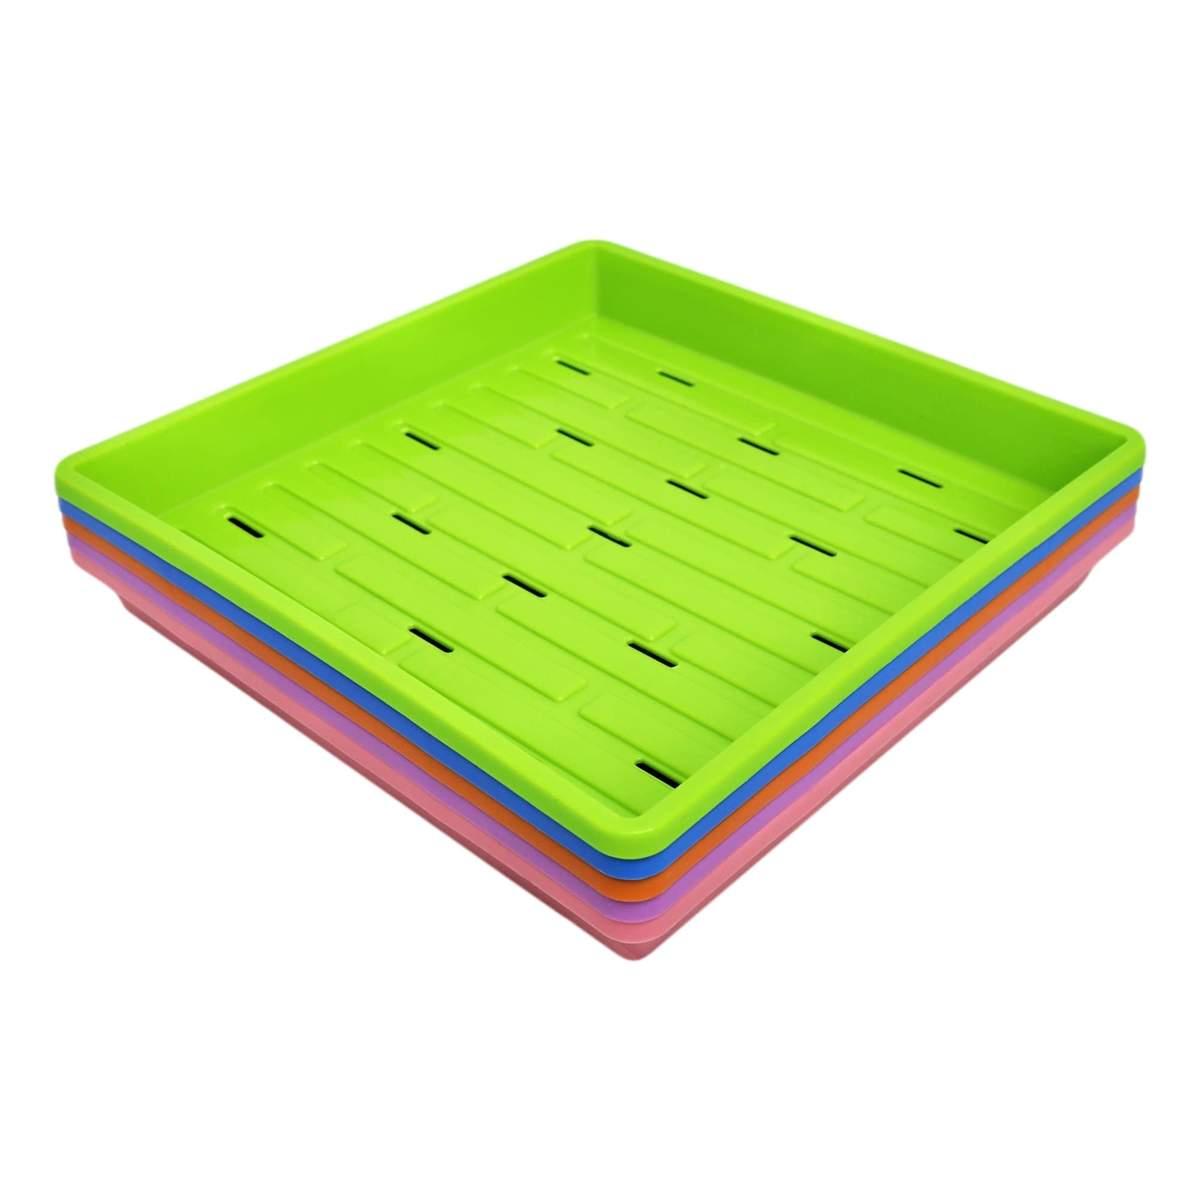 Bootstrap Farmer 10x10 Microgreen Trays